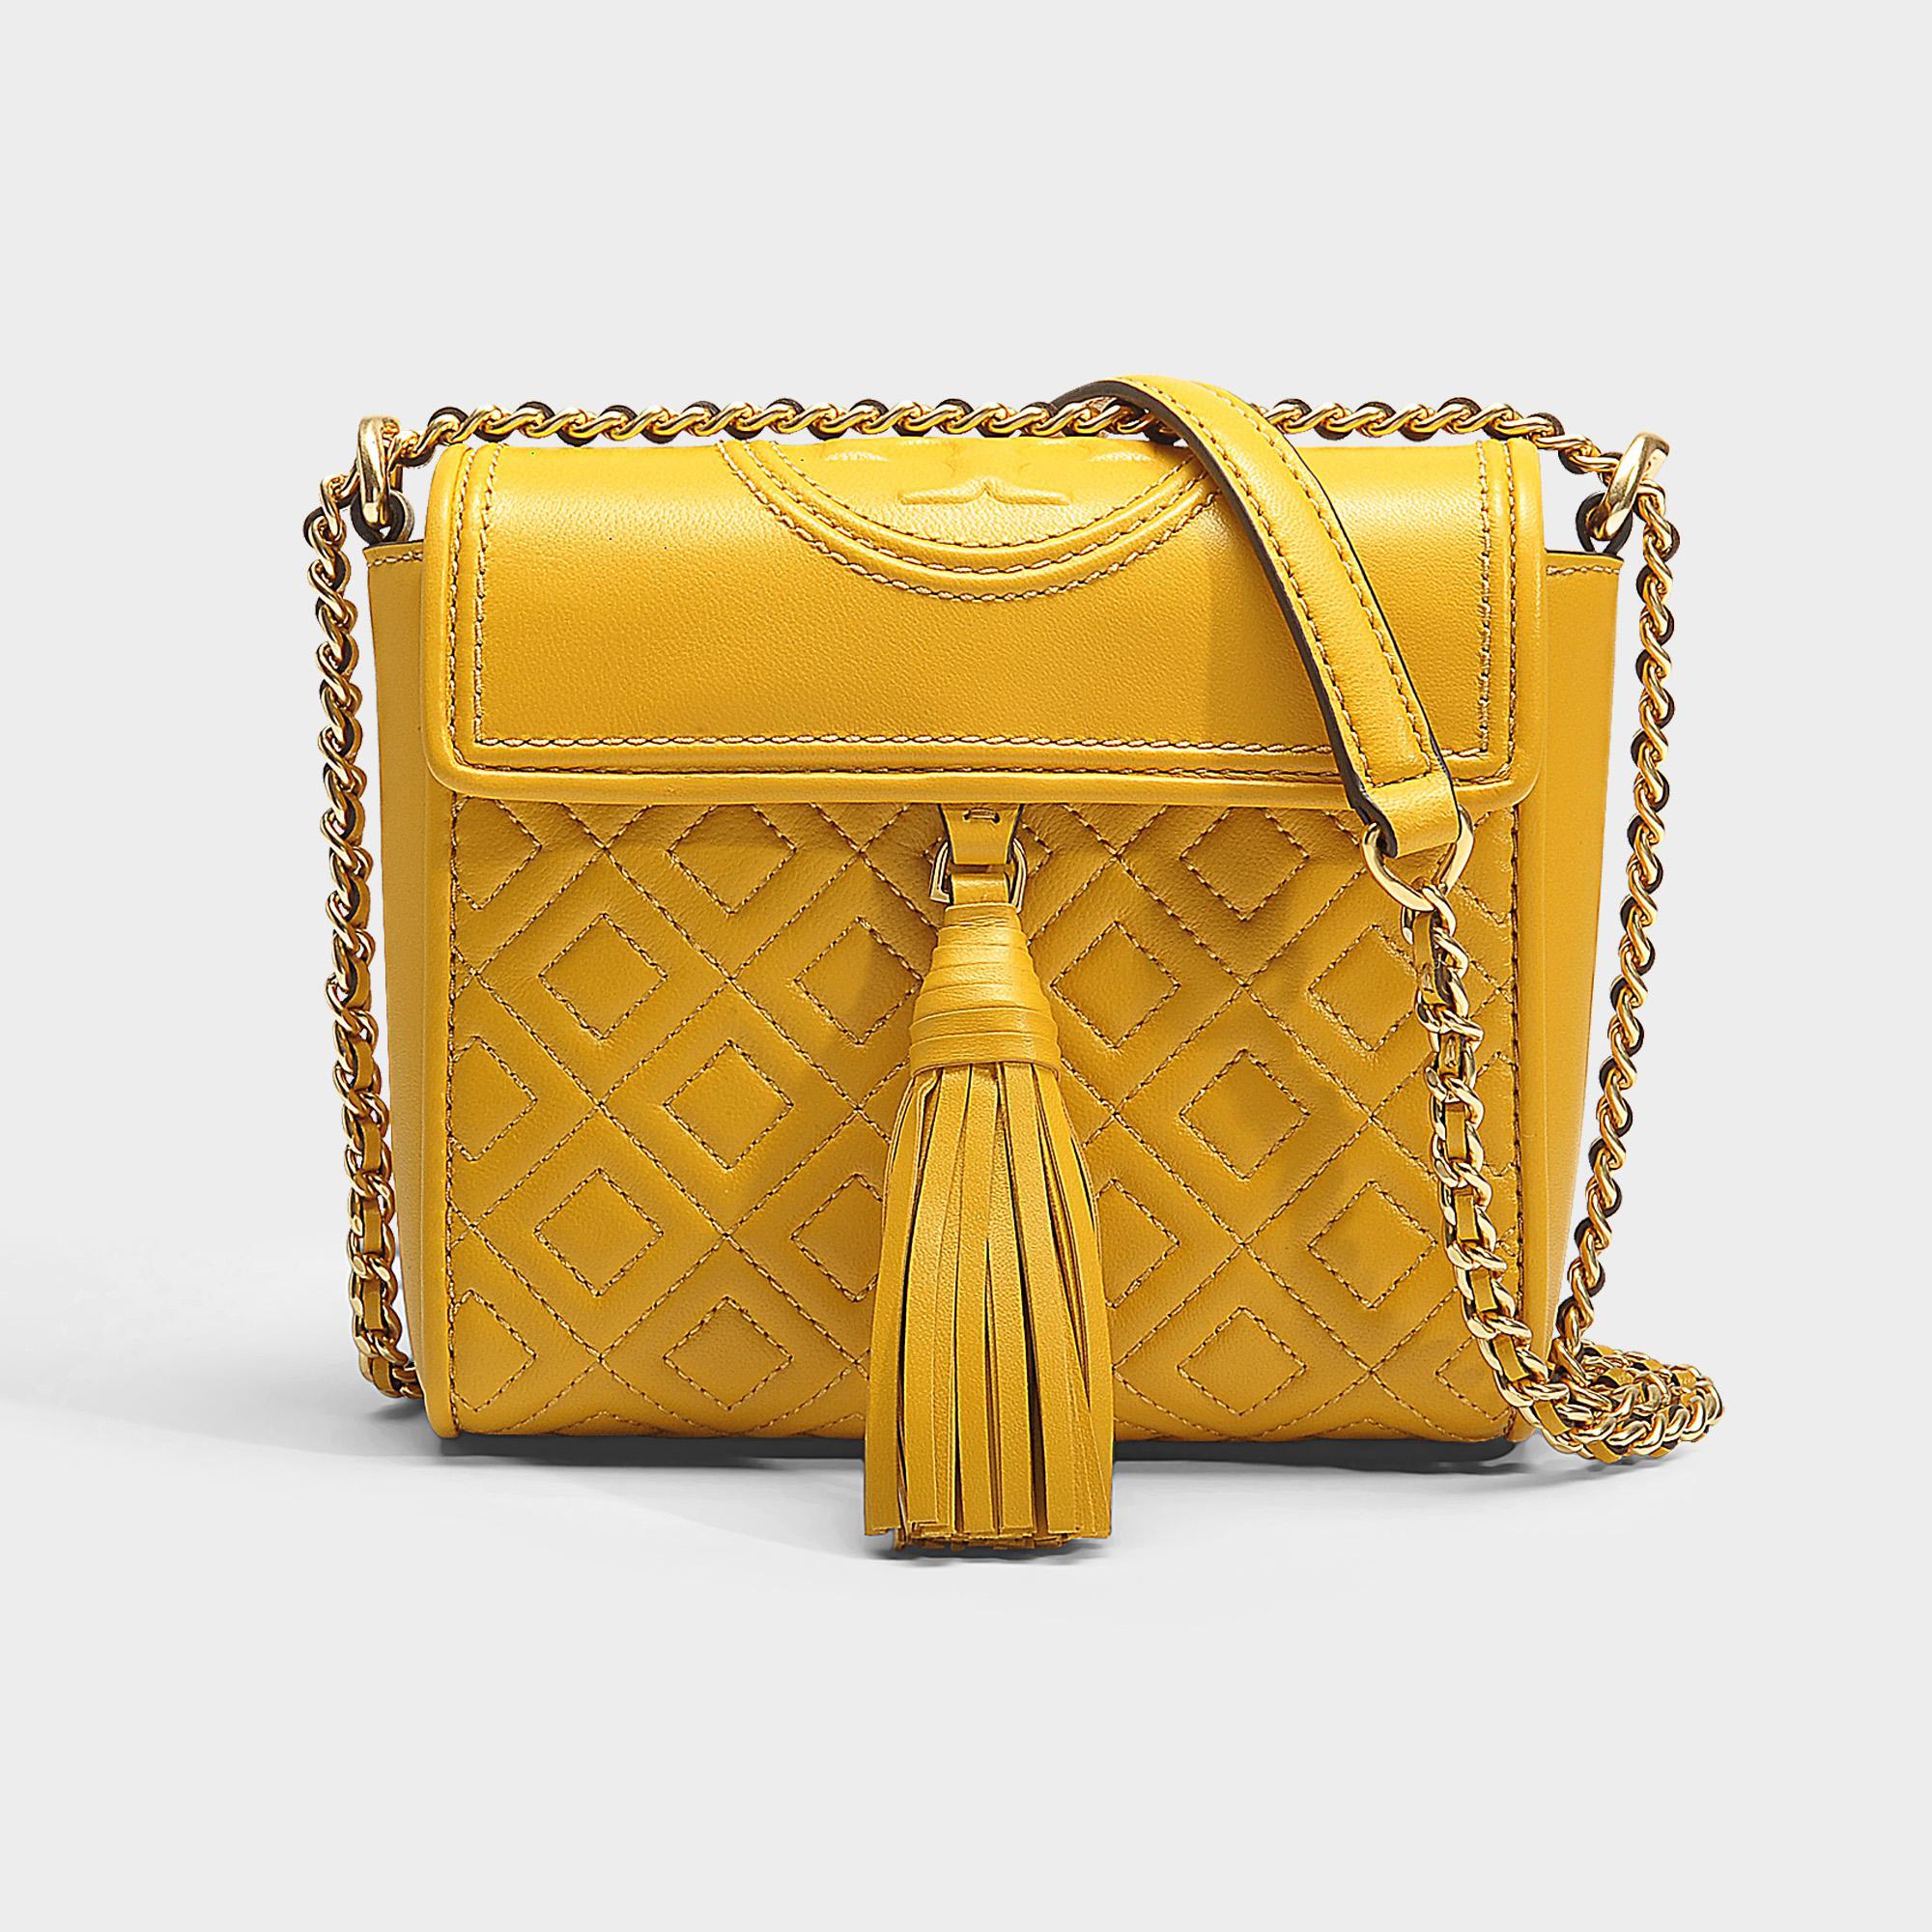 0c40c8e58d6 Lyst - Tory Burch Fleming Box Crossbody Bag in Yellow